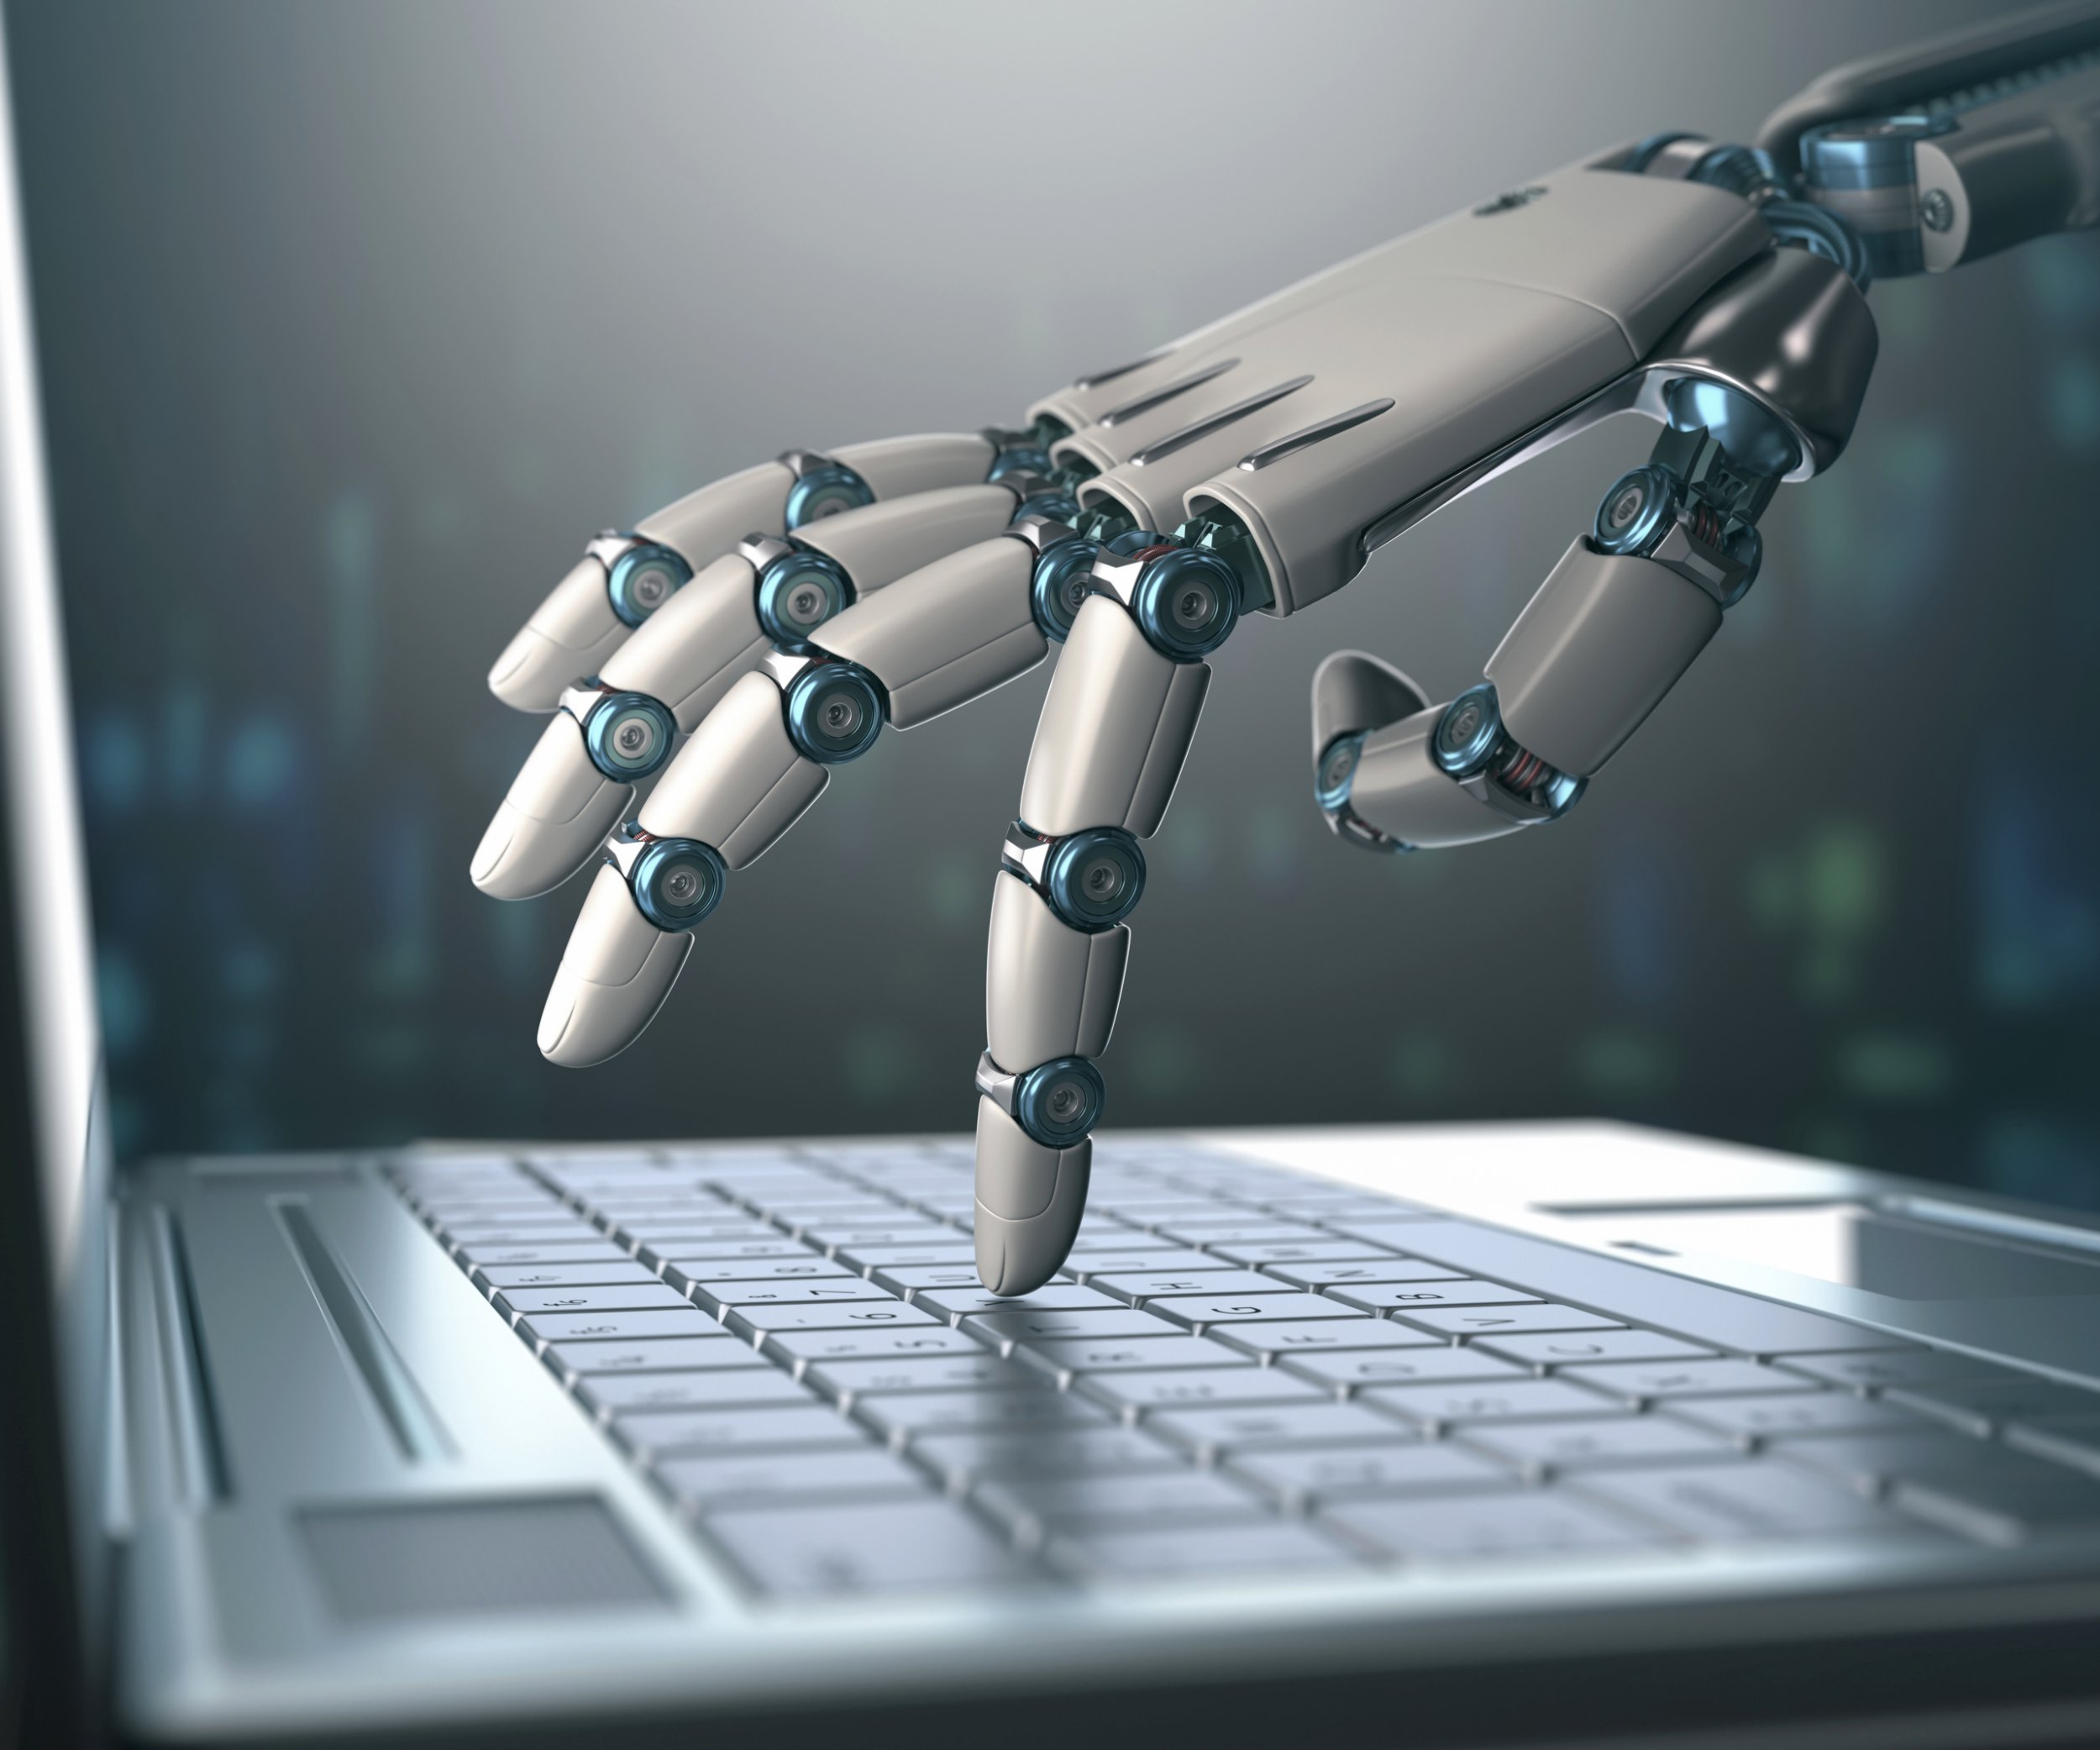 Robotic hand using a laptop computer, illustration.